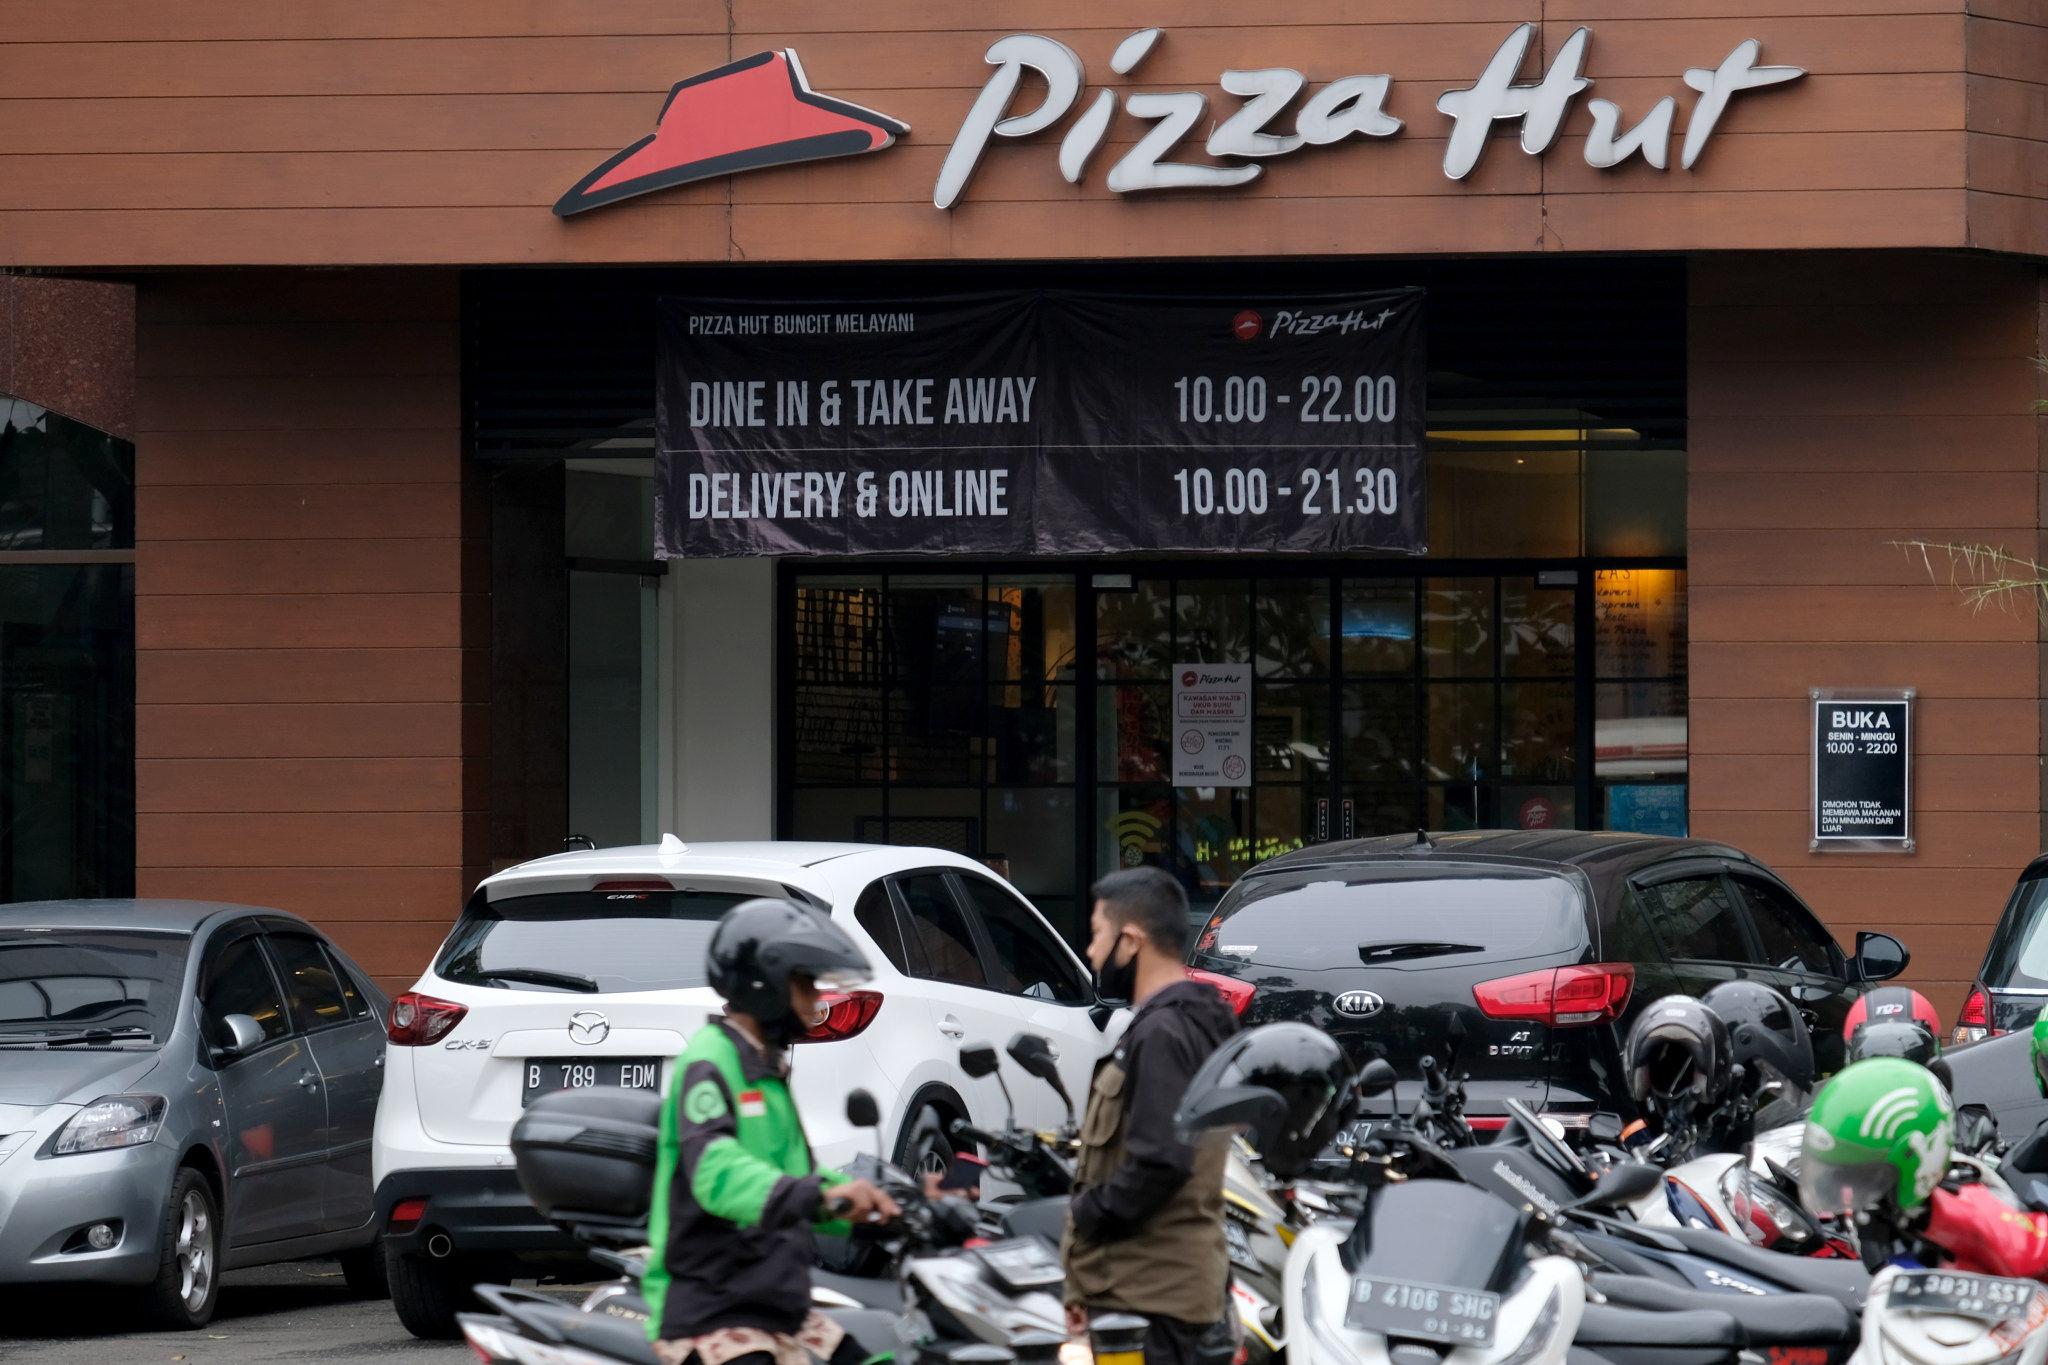 Gara-Gara Corona, Pizza Hut Berbalik Tekor Rp93,52 Miliar